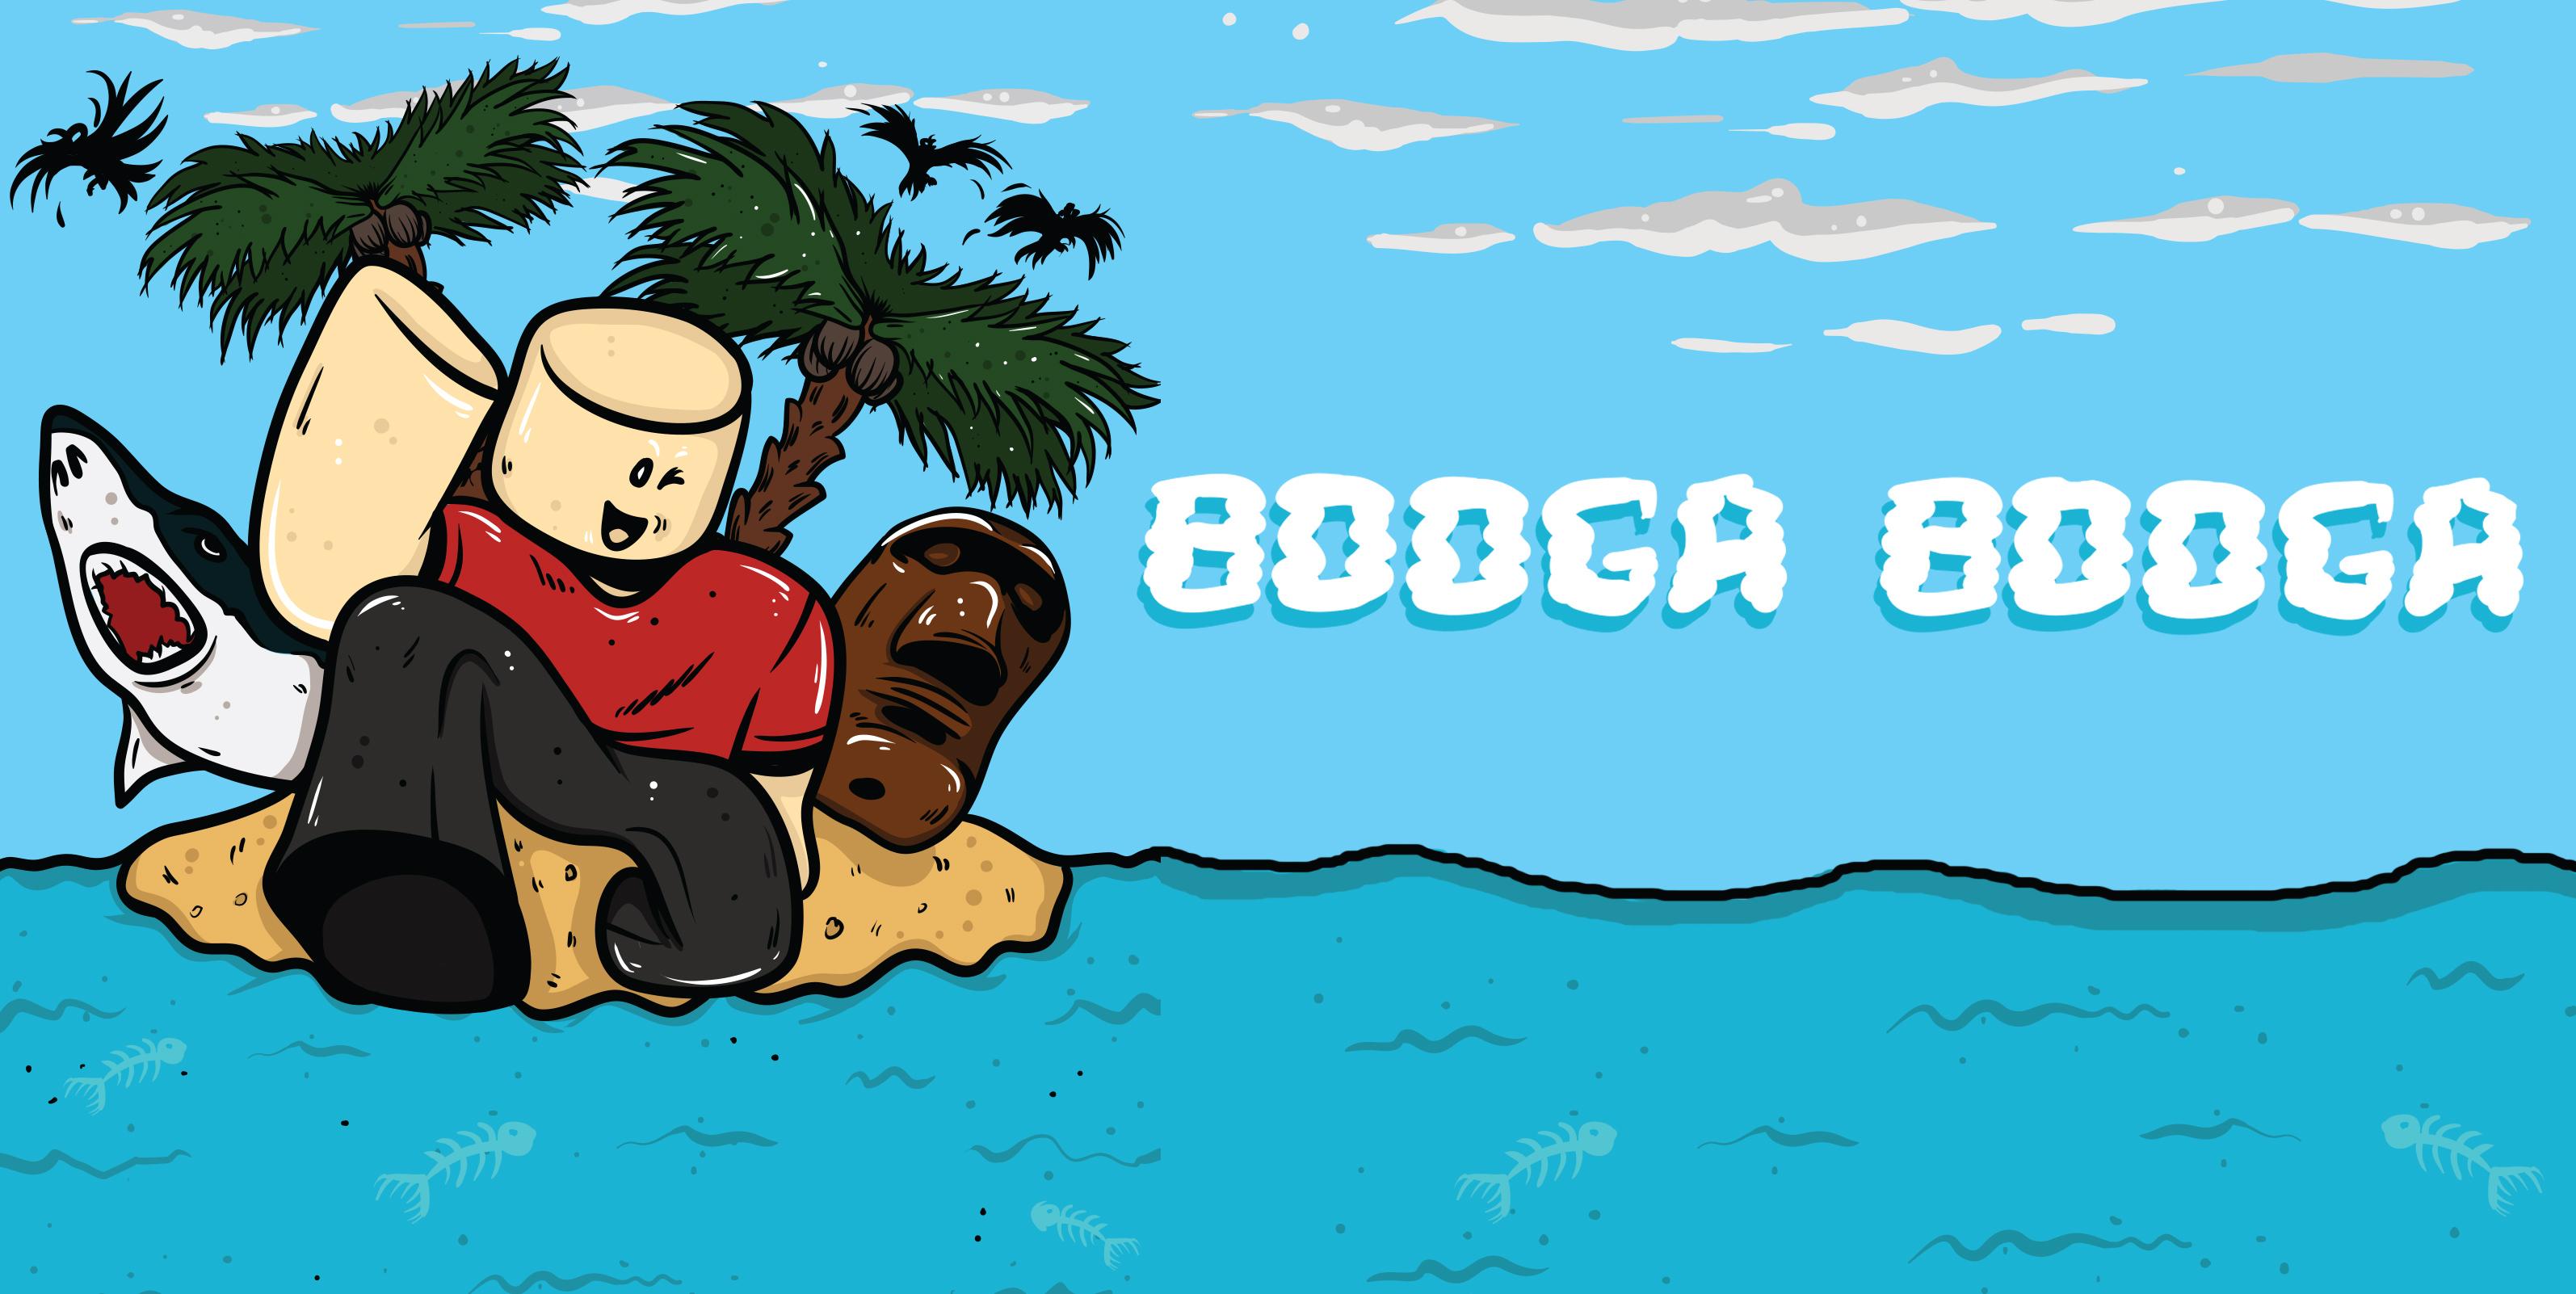 Freebie Diary Of A Roblox Genius Booga Booga Robloxia Kid - www roblox login com landing animated